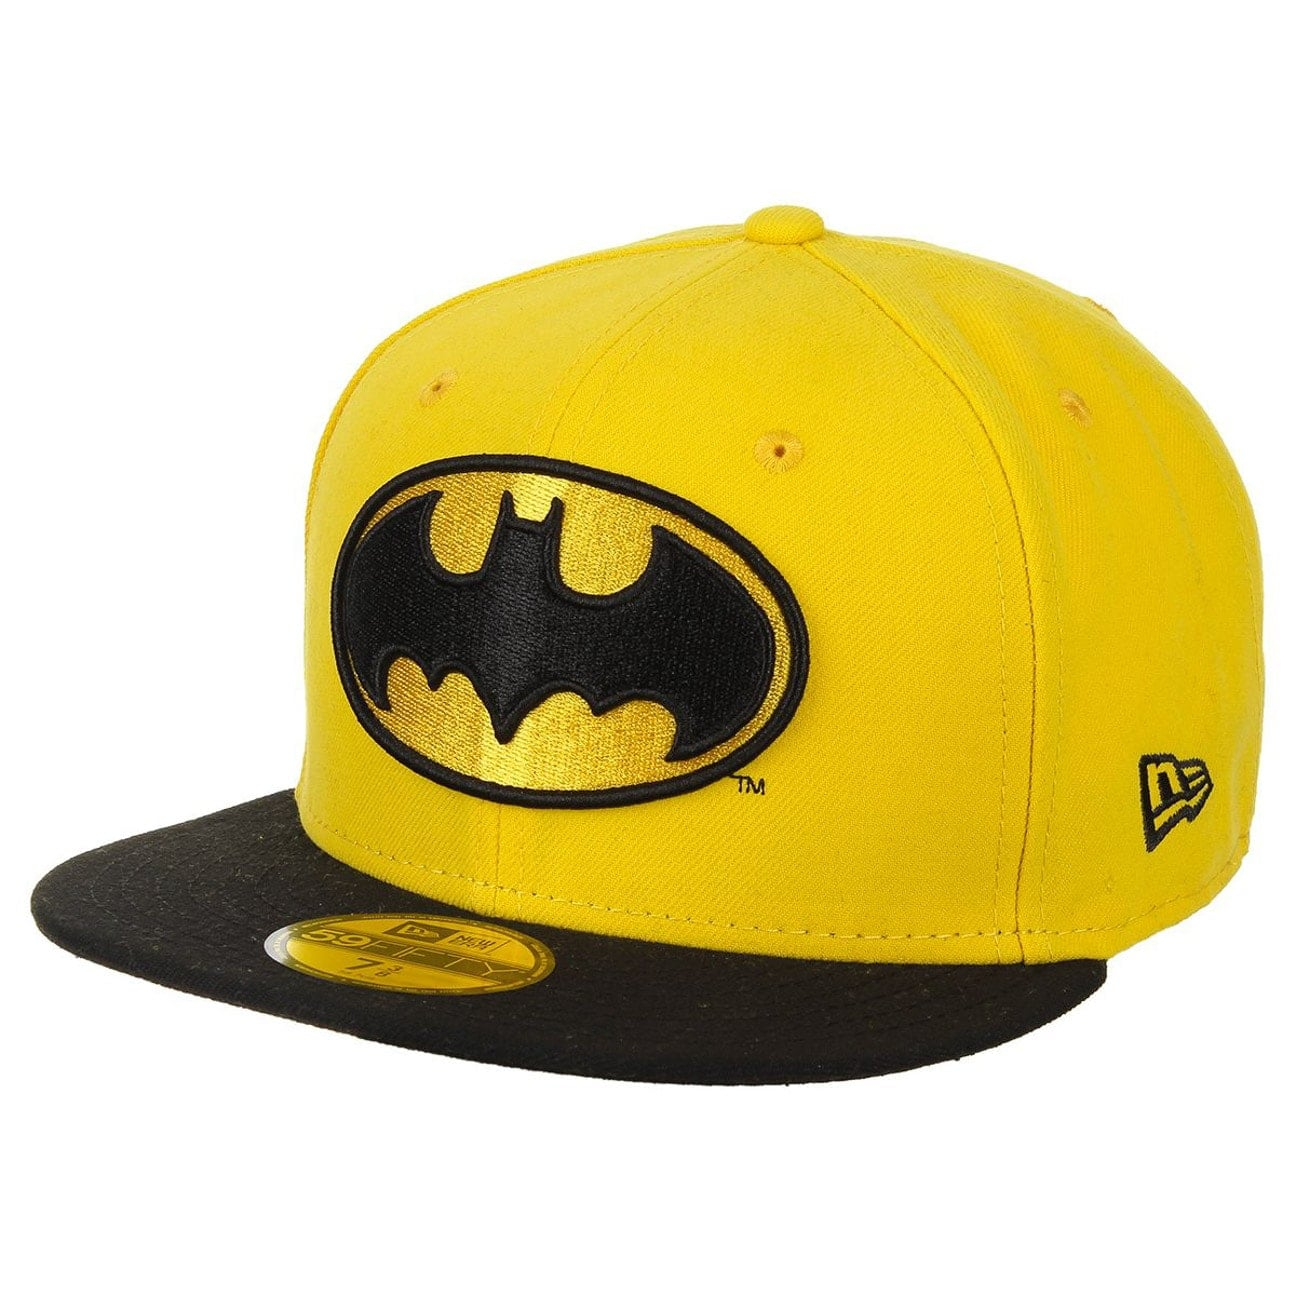 59fifty batman cap by new era eur 39 00 hats caps beanies shop online. Black Bedroom Furniture Sets. Home Design Ideas